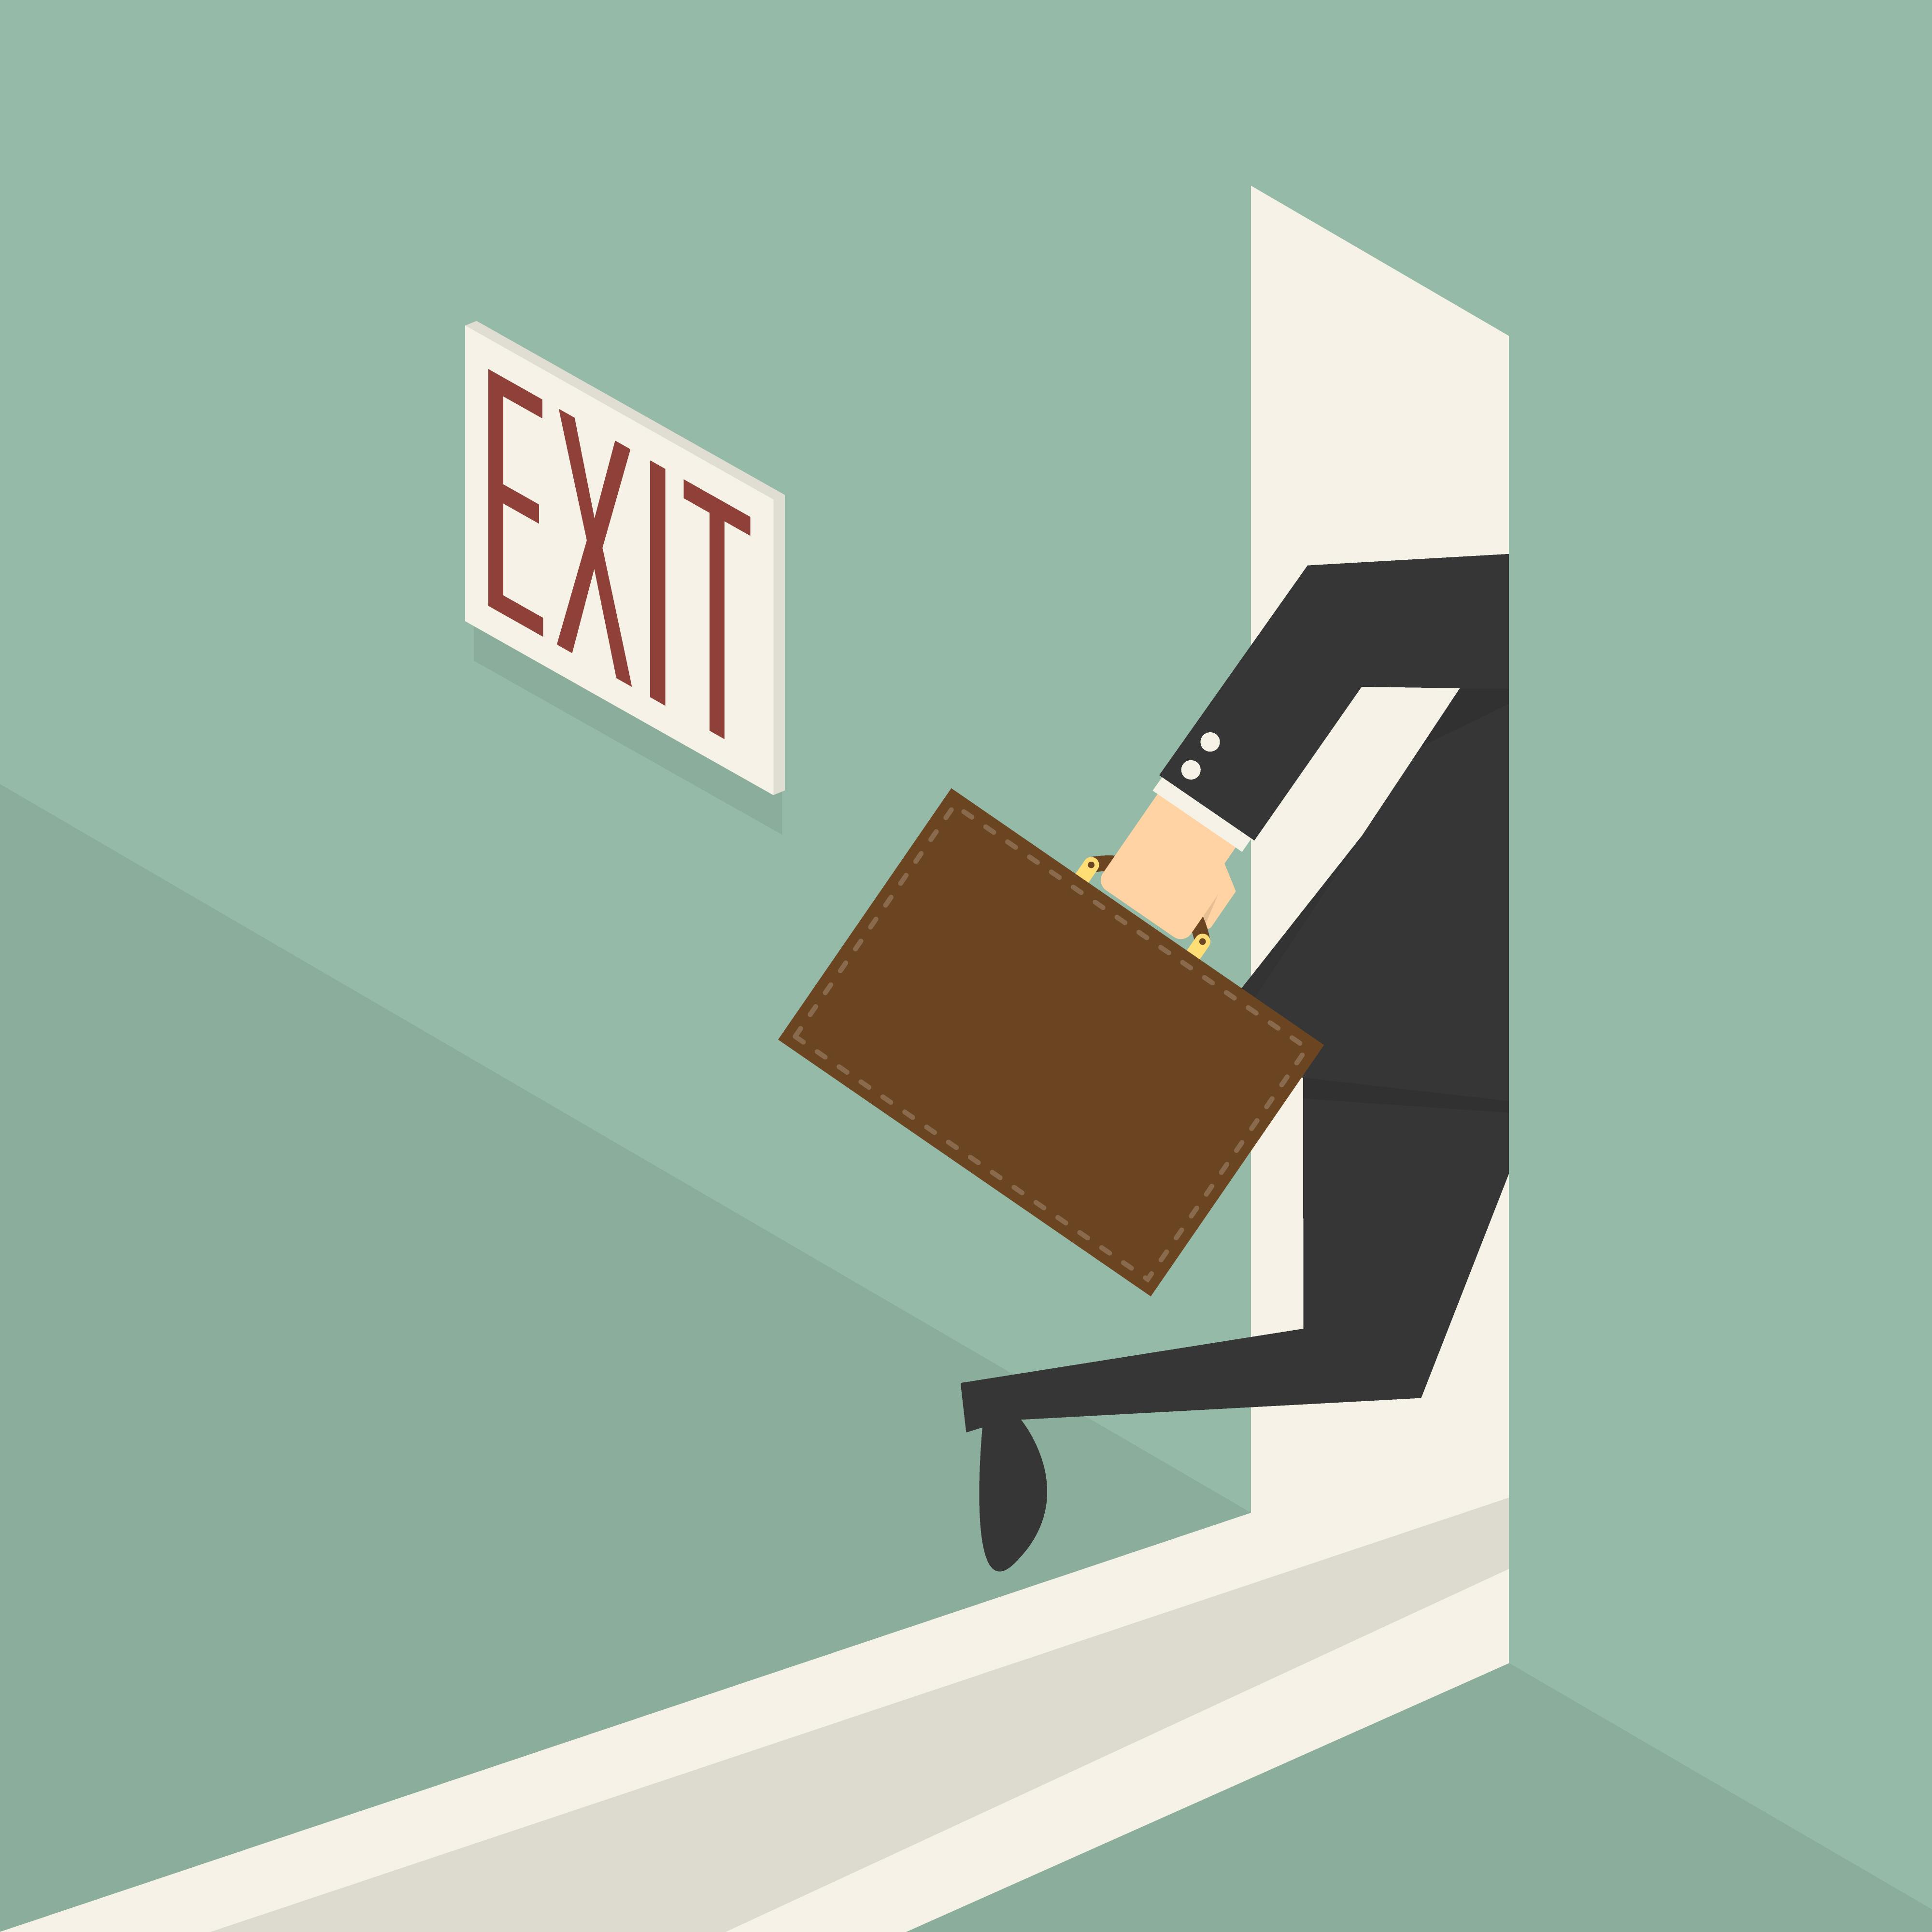 board resignation when how directorpoint board resignation